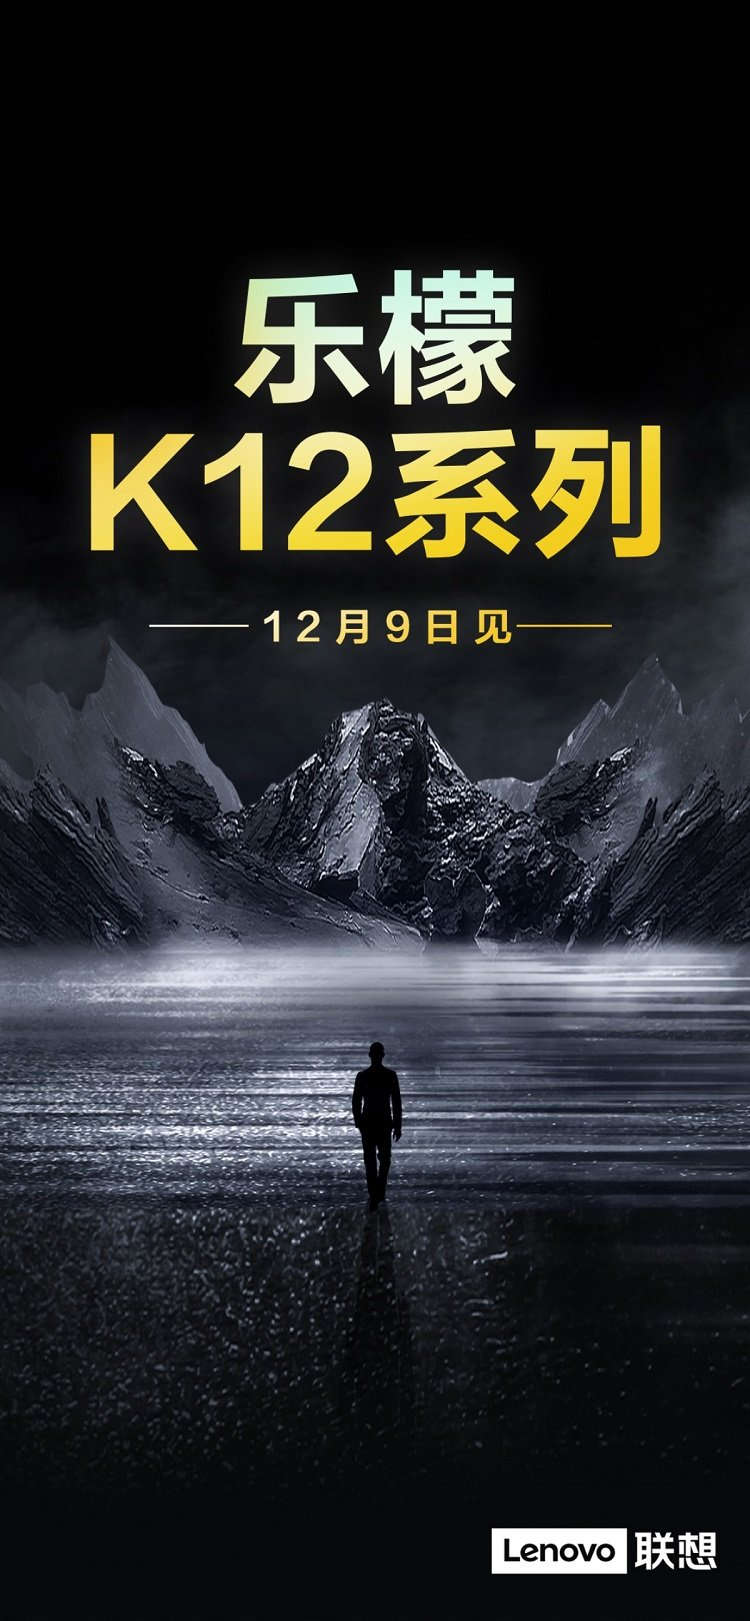 lemon k12 series 1 لنوو